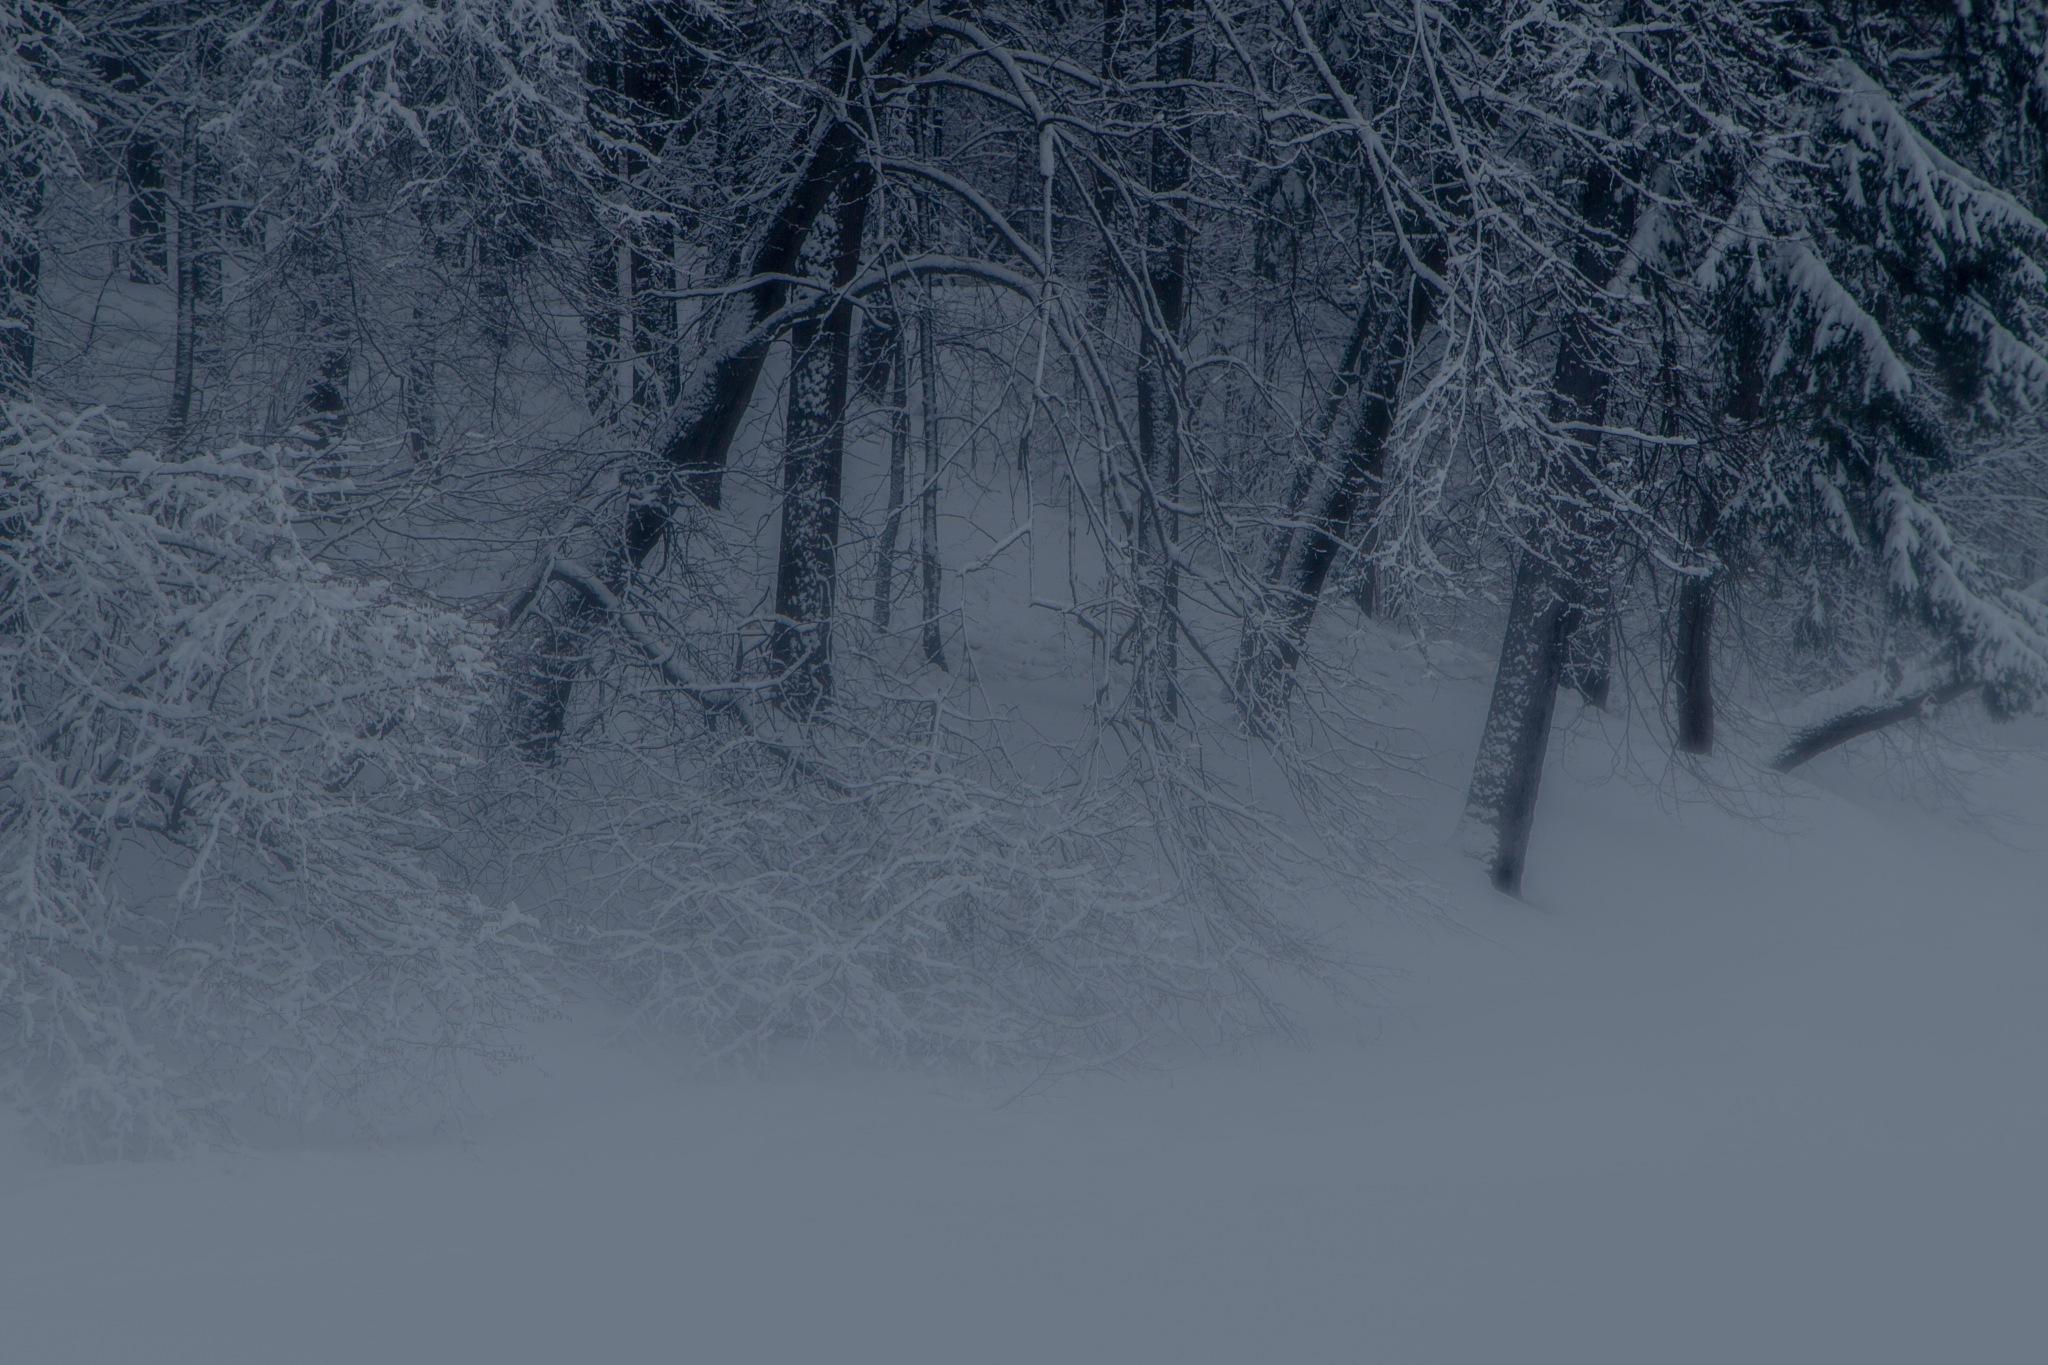 Winter magic by Andrey Domnikov